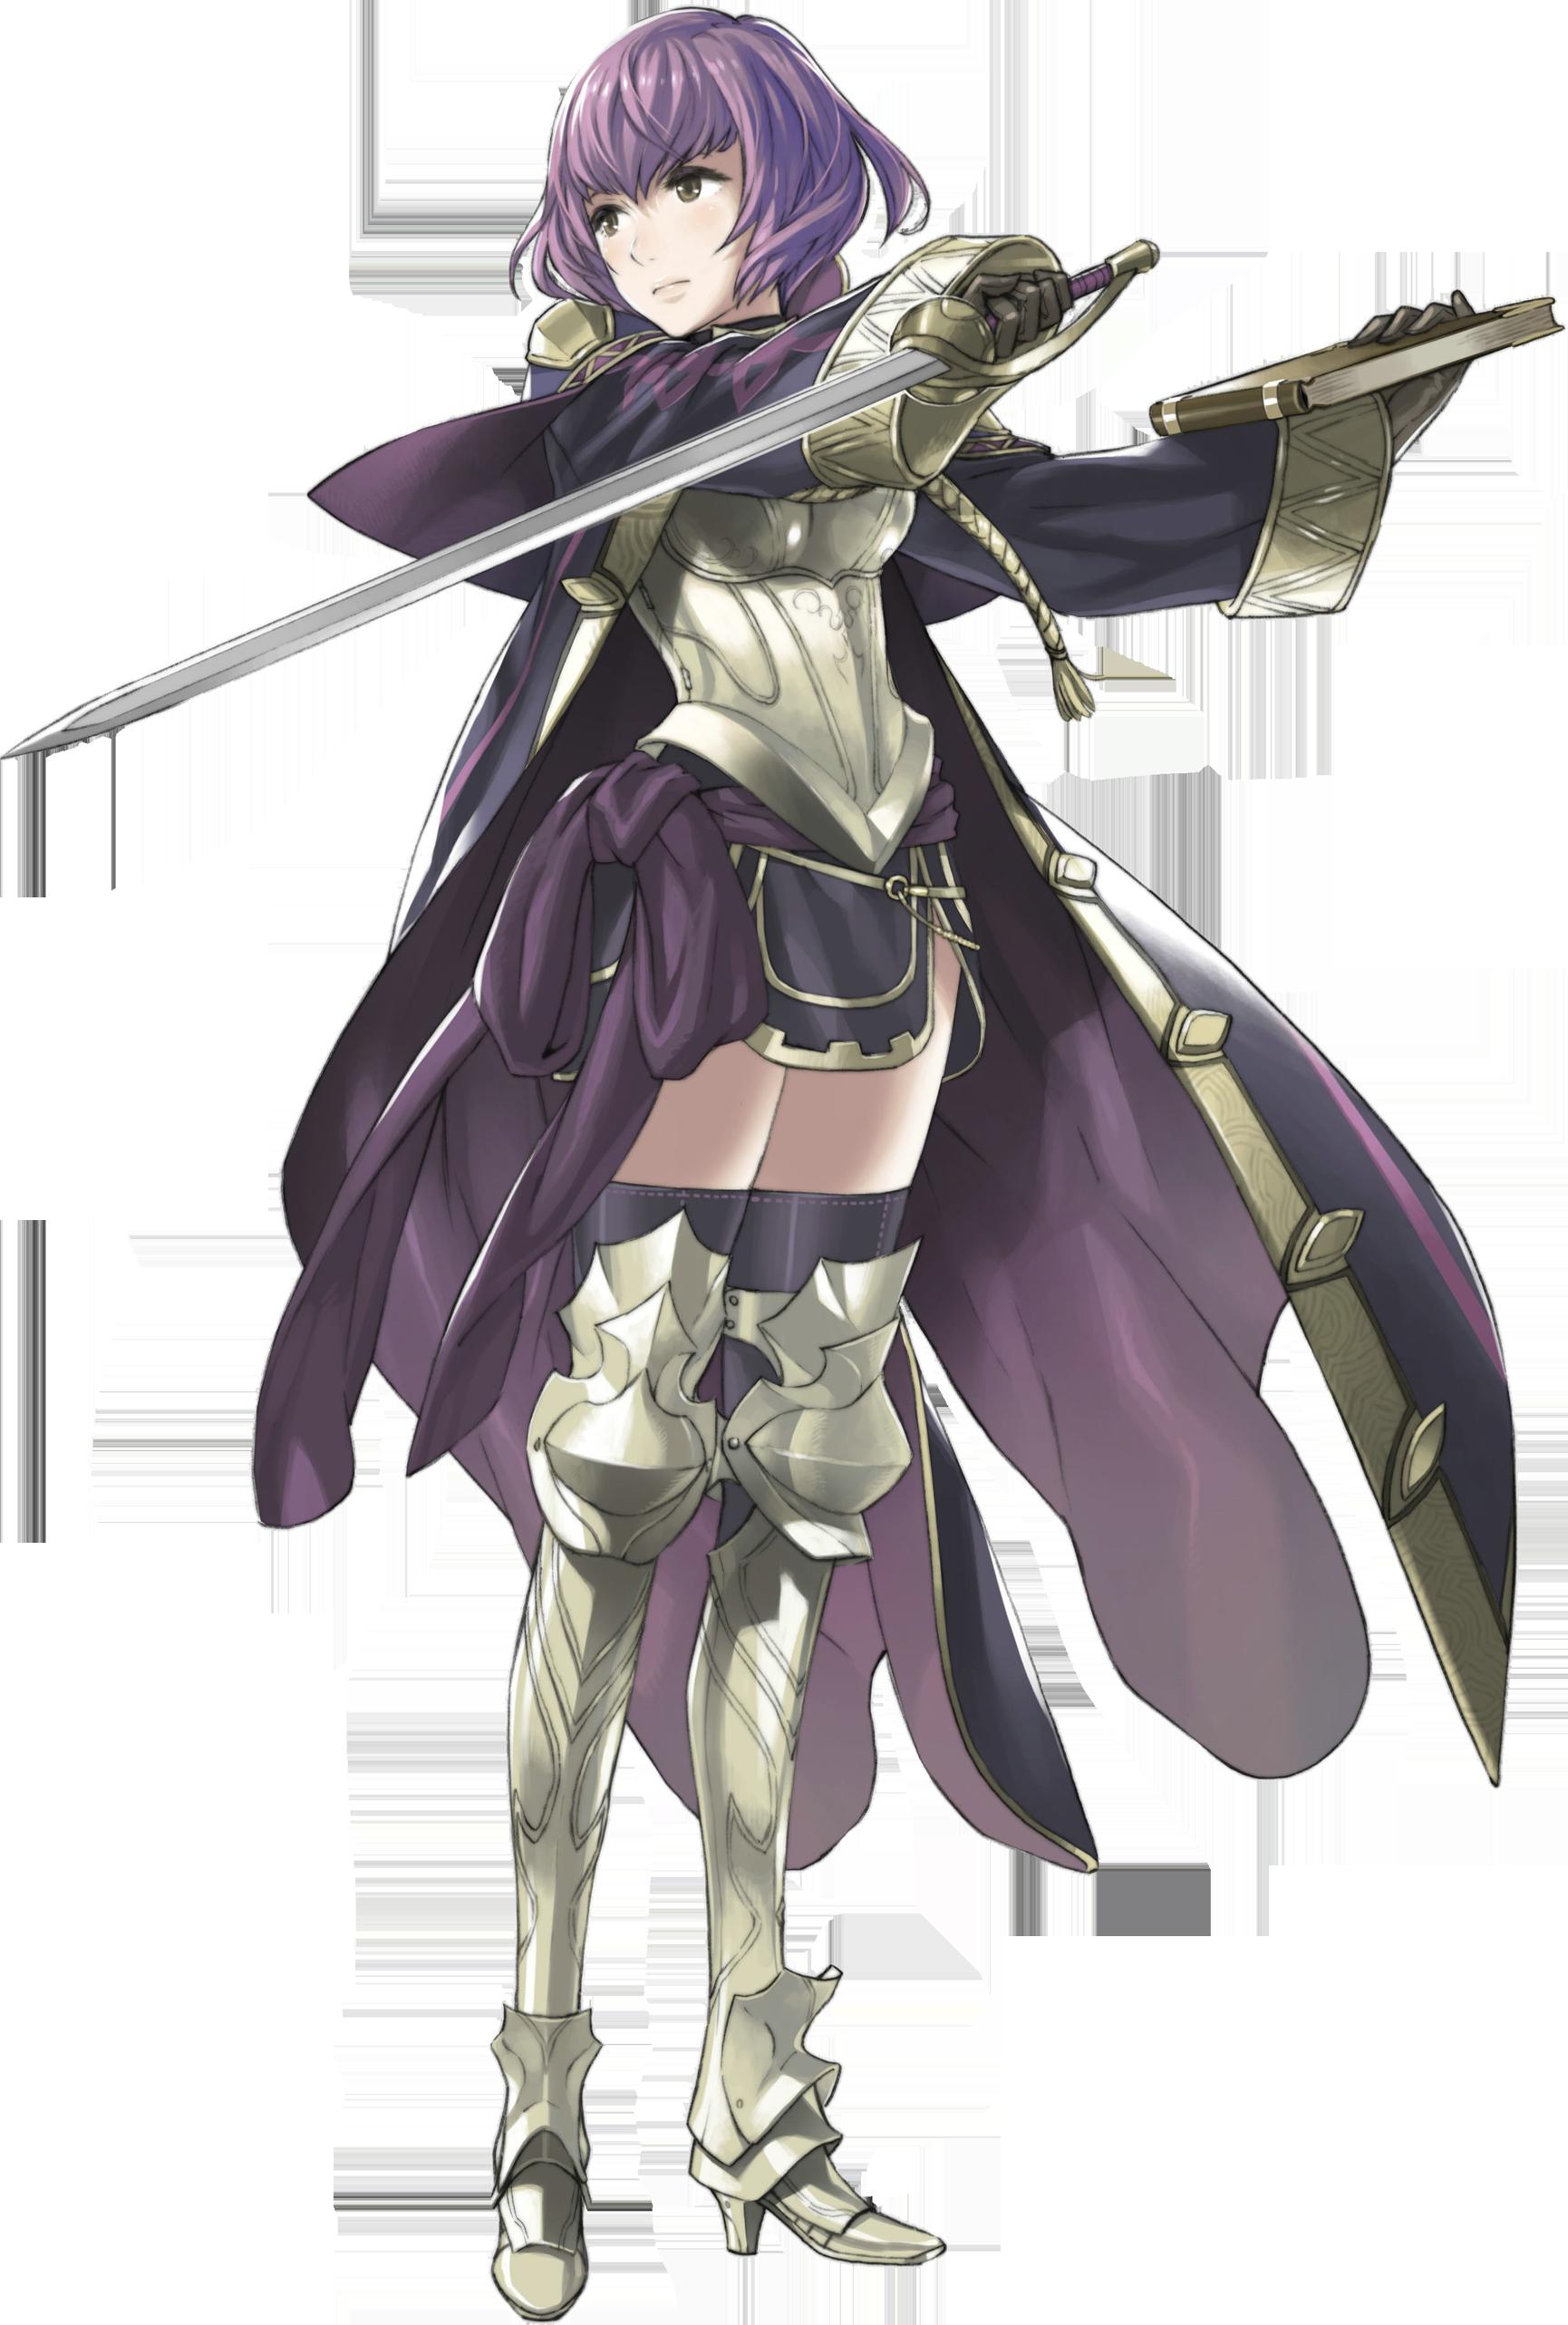 Magical Eponine | Waifu Emblem Fates Wikia | FANDOM